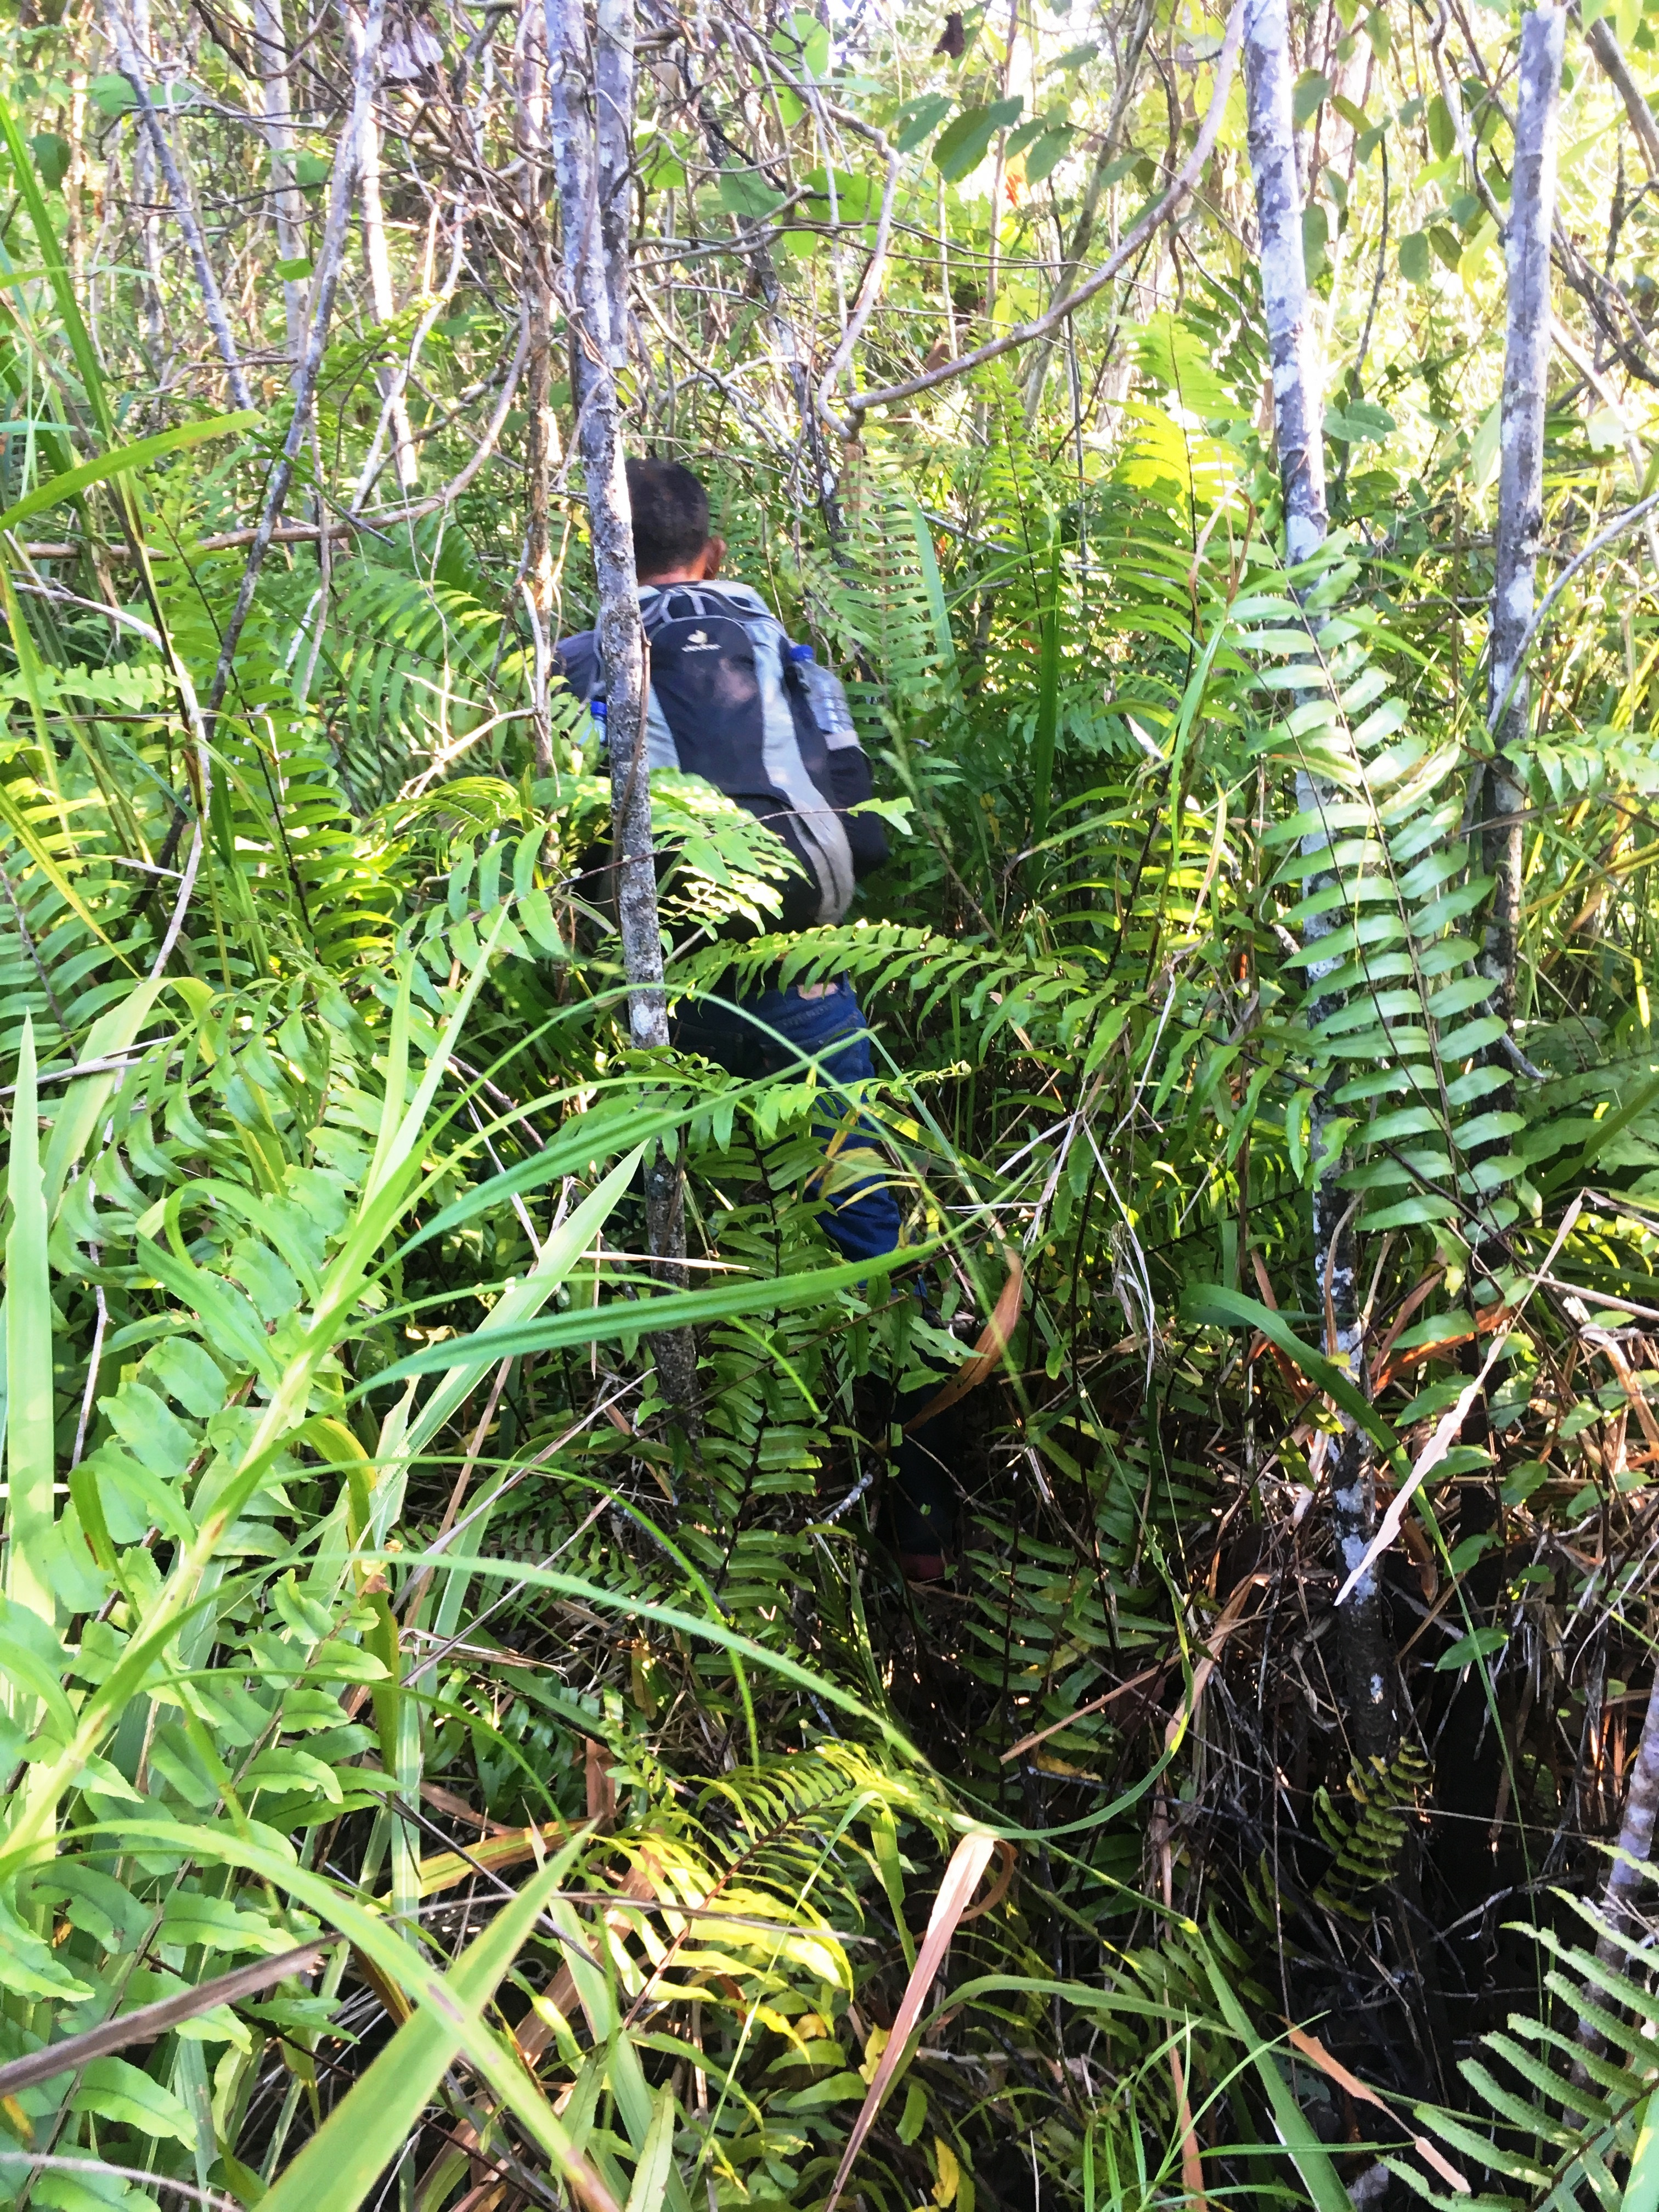 Gunung-Sabatai-Bashing-through-heavy-undergrowth-Nick-Hughes-September-2019